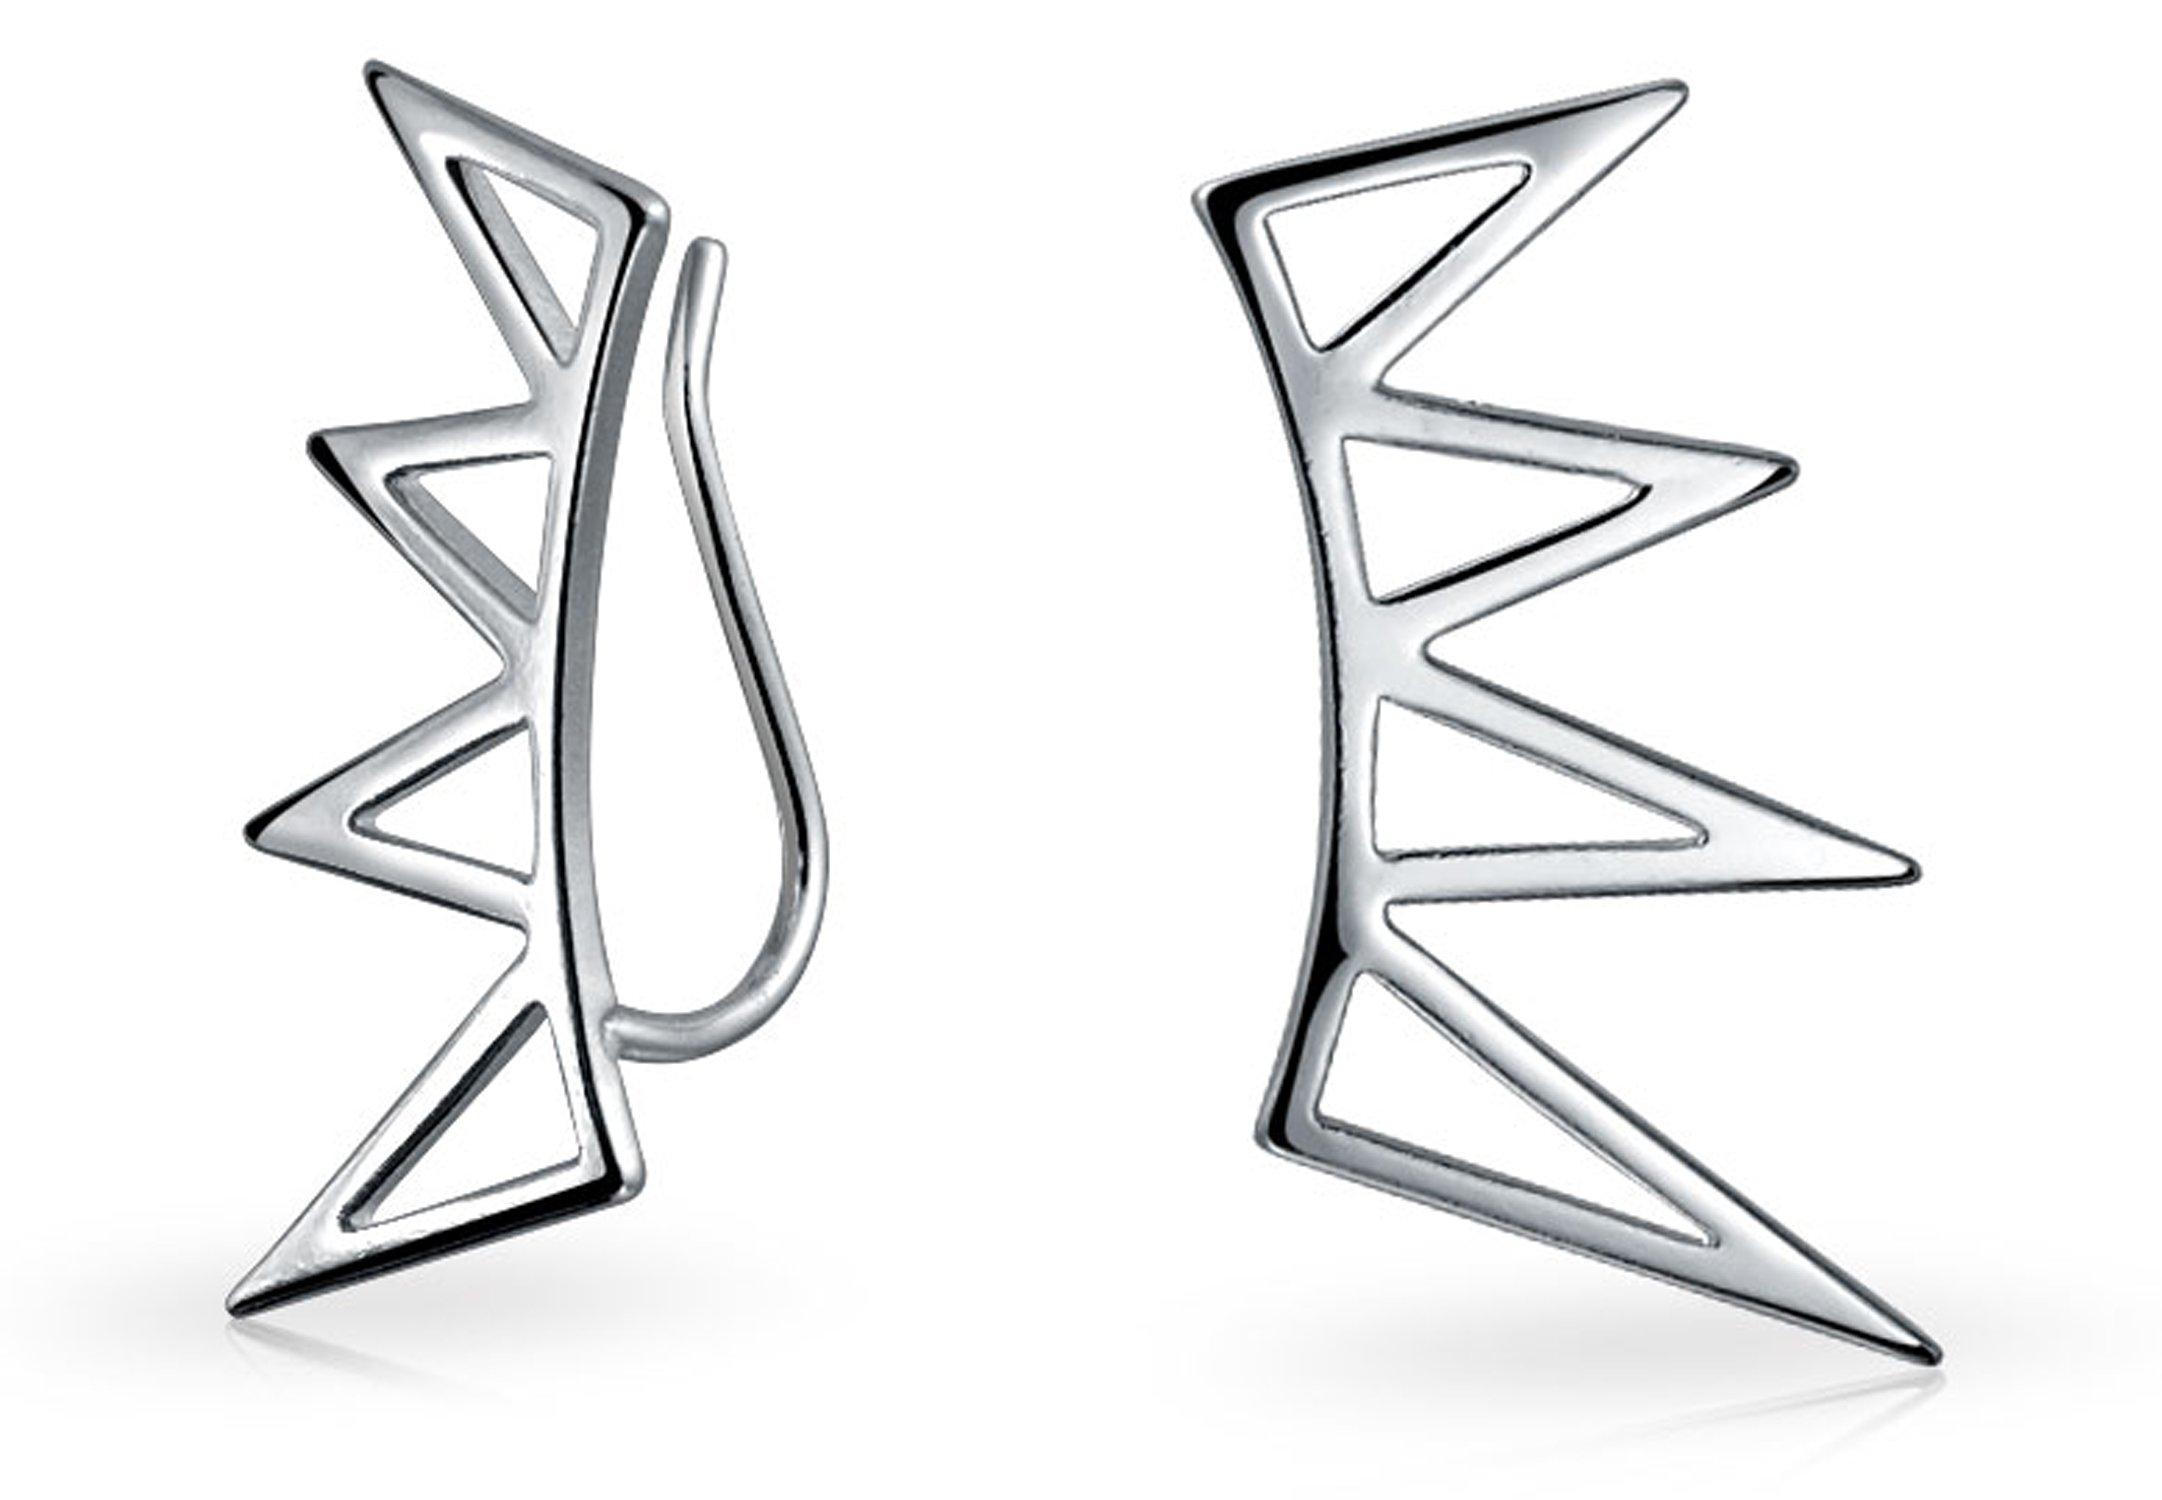 Minimalist Geometric Spike Triangles Ear Pin Warp Climbers Earrings For Women For Teen Crawlers 925 Sterling Silver